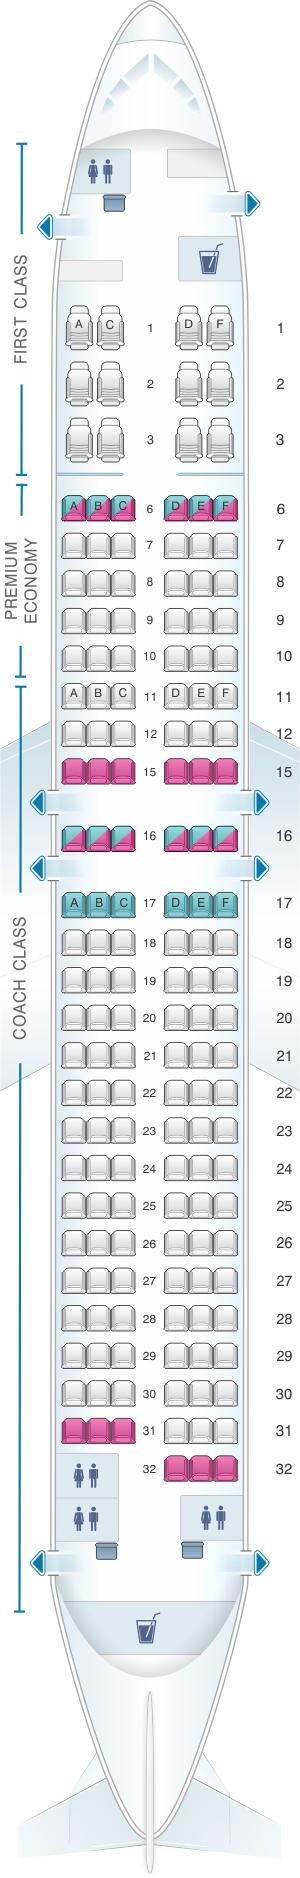 Seat map for Alaska Airlines - Horizon Air Boeing B737 800